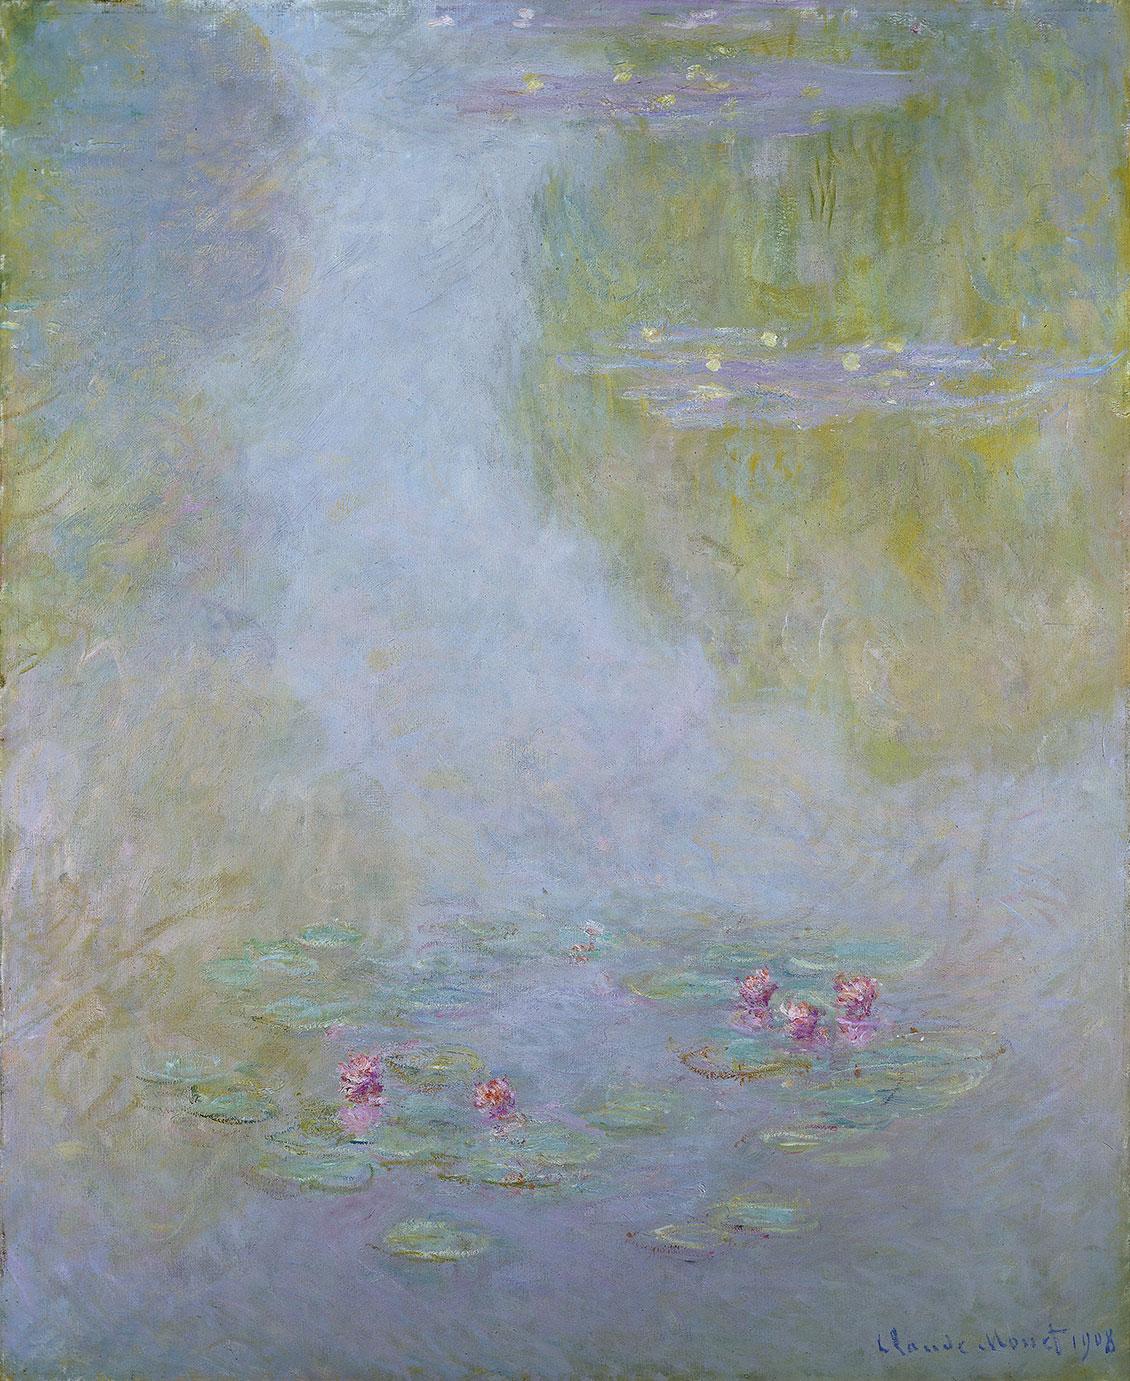 Claude Monet, Åkander, 1908. Amgueddfa Cymru - National Museum Wales. Testamentarisk arv fra Gwendoline Davies, 1951. Foto: National Museum Wales